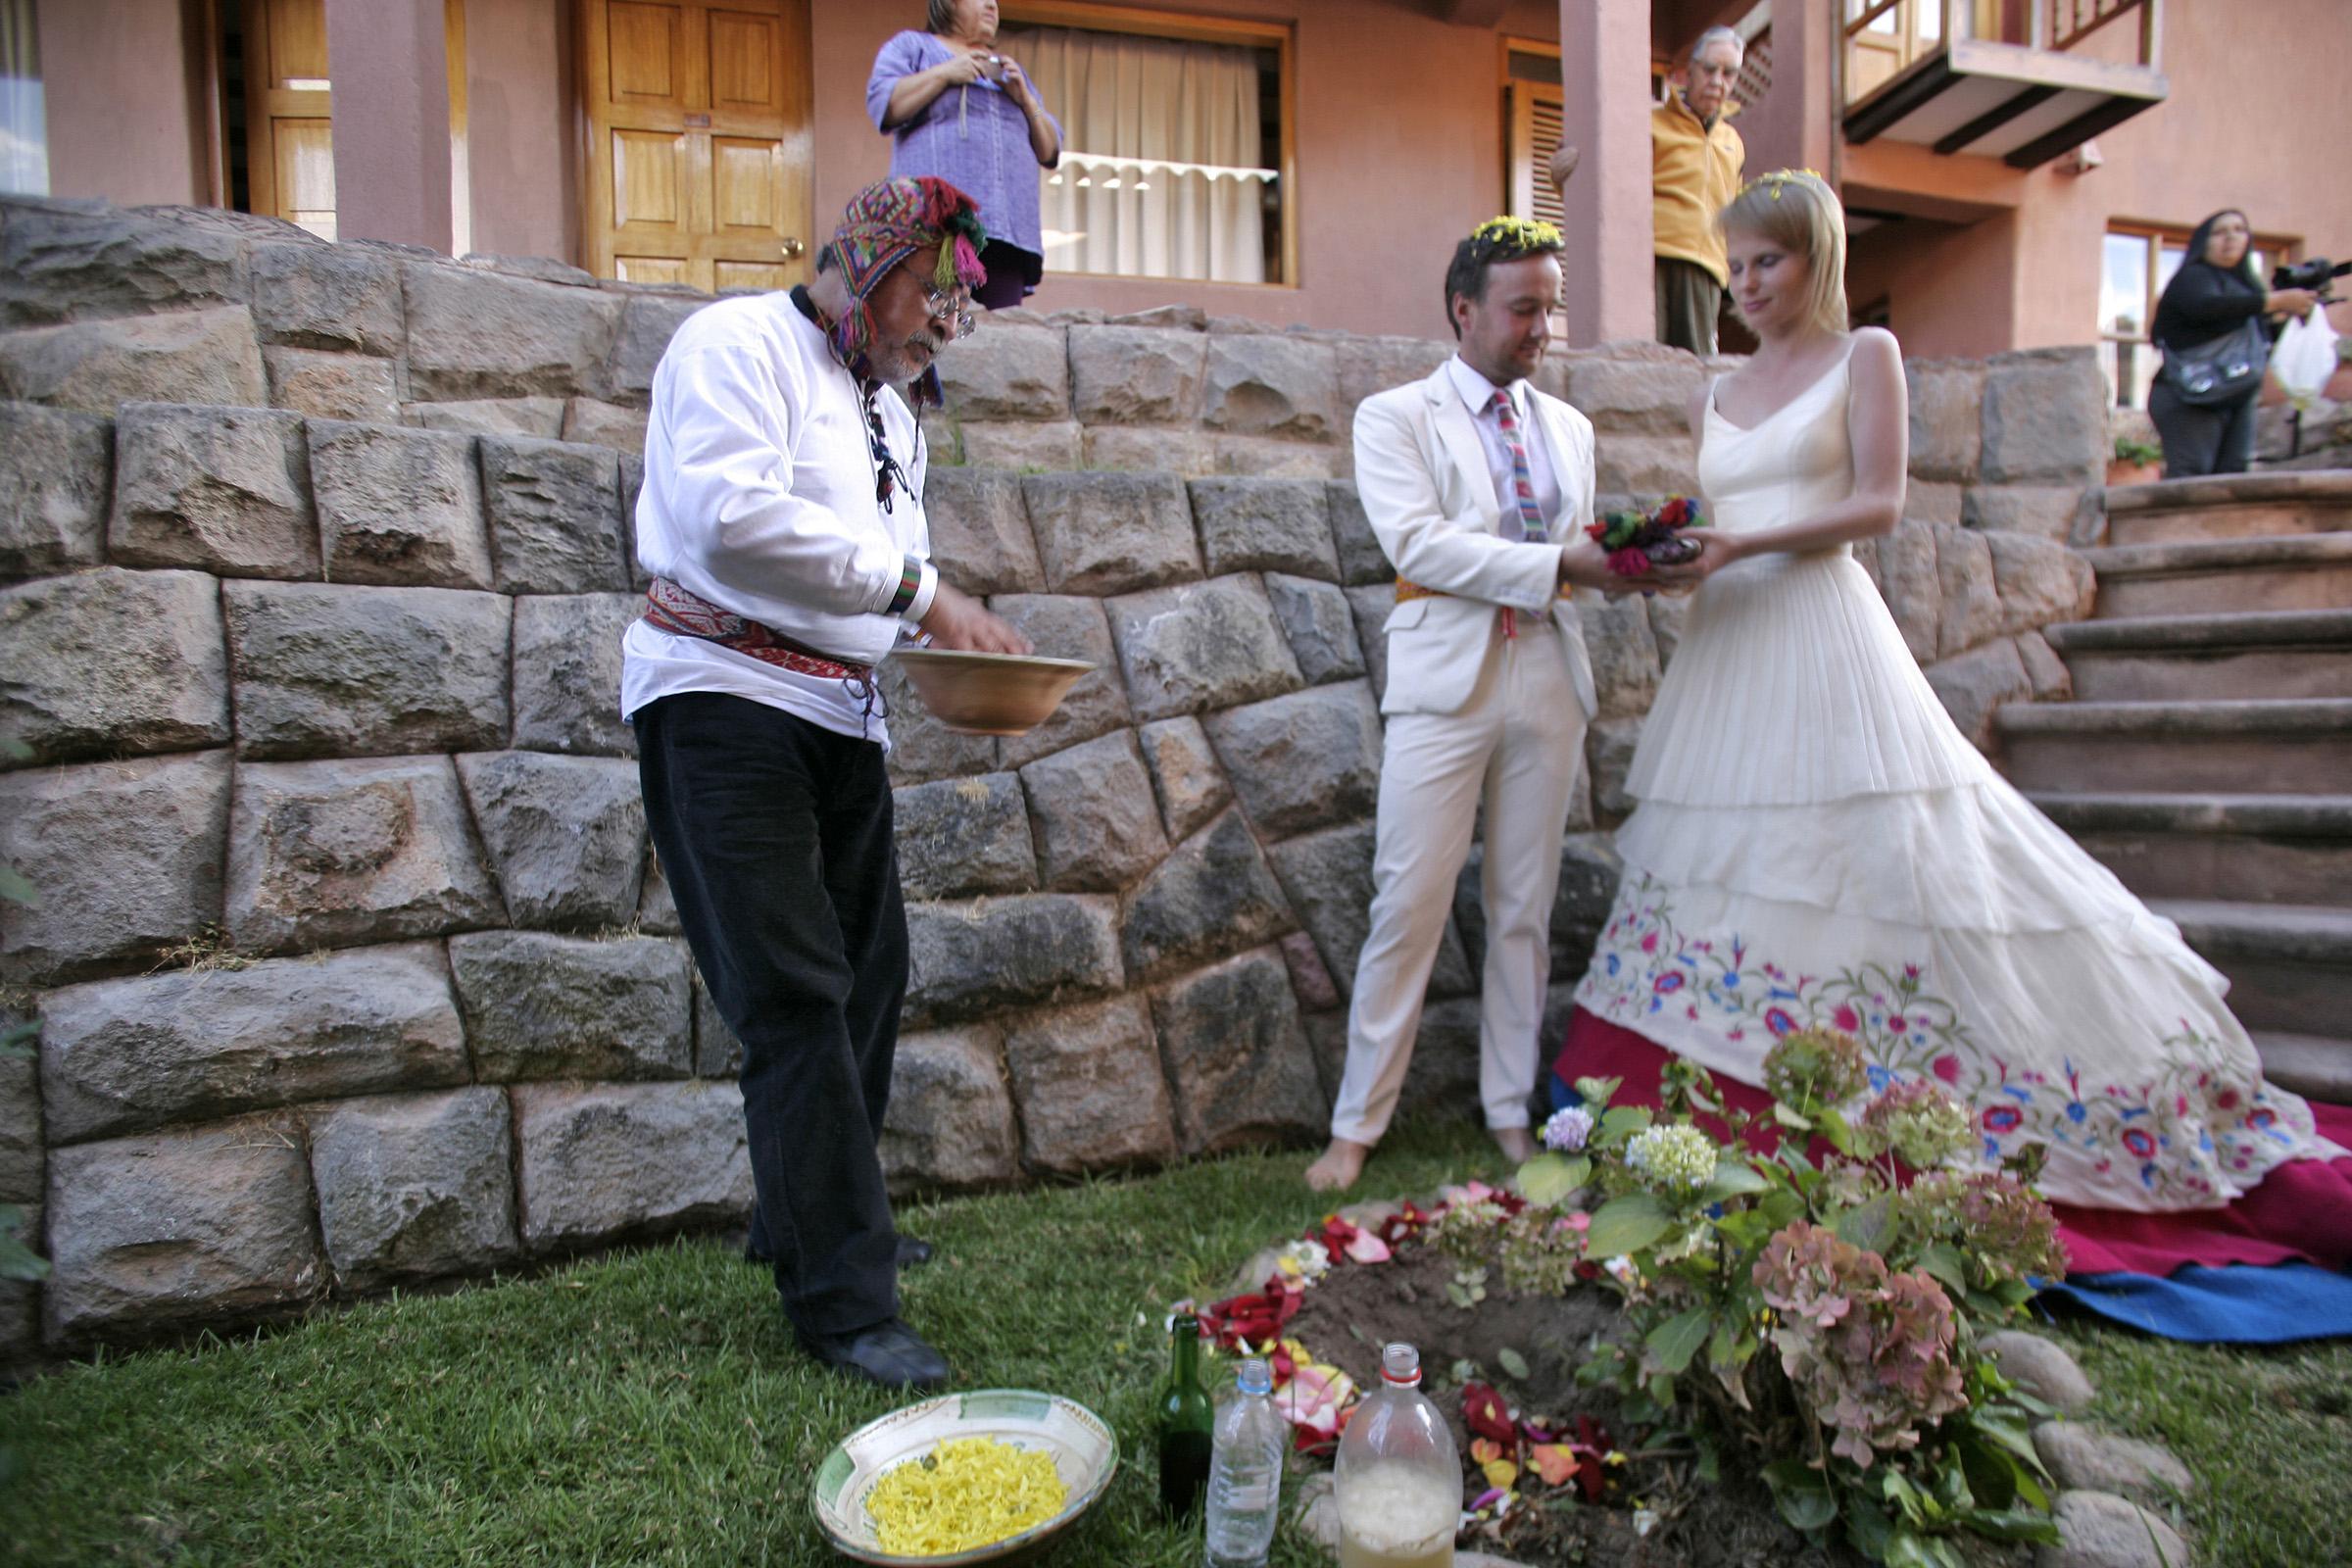 Matrimonio Simbolico En Peru : El matrimonio andino de people life habías pensado en